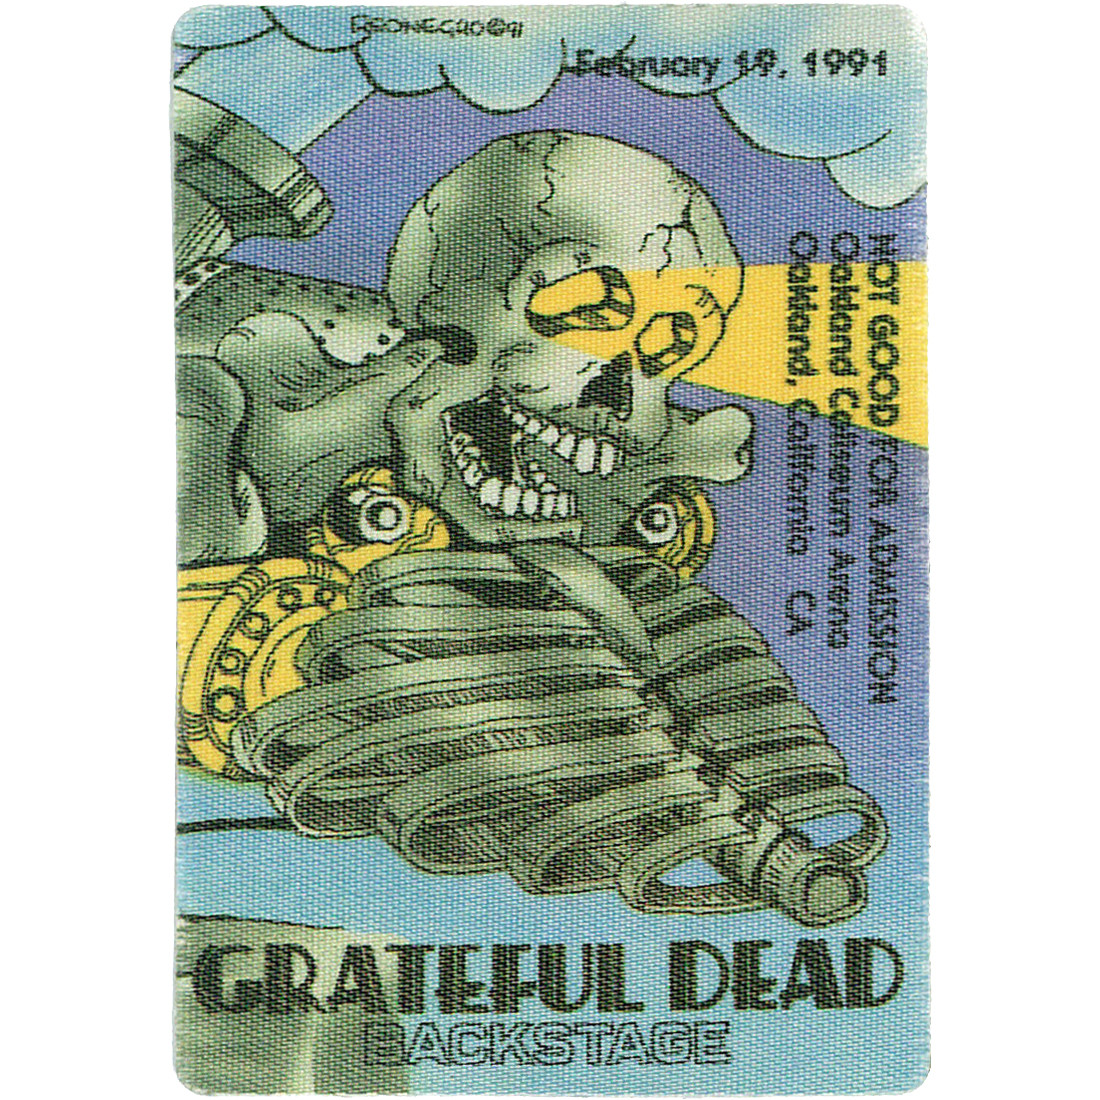 Grateful Dead 1991 02-19 Backstage Pass